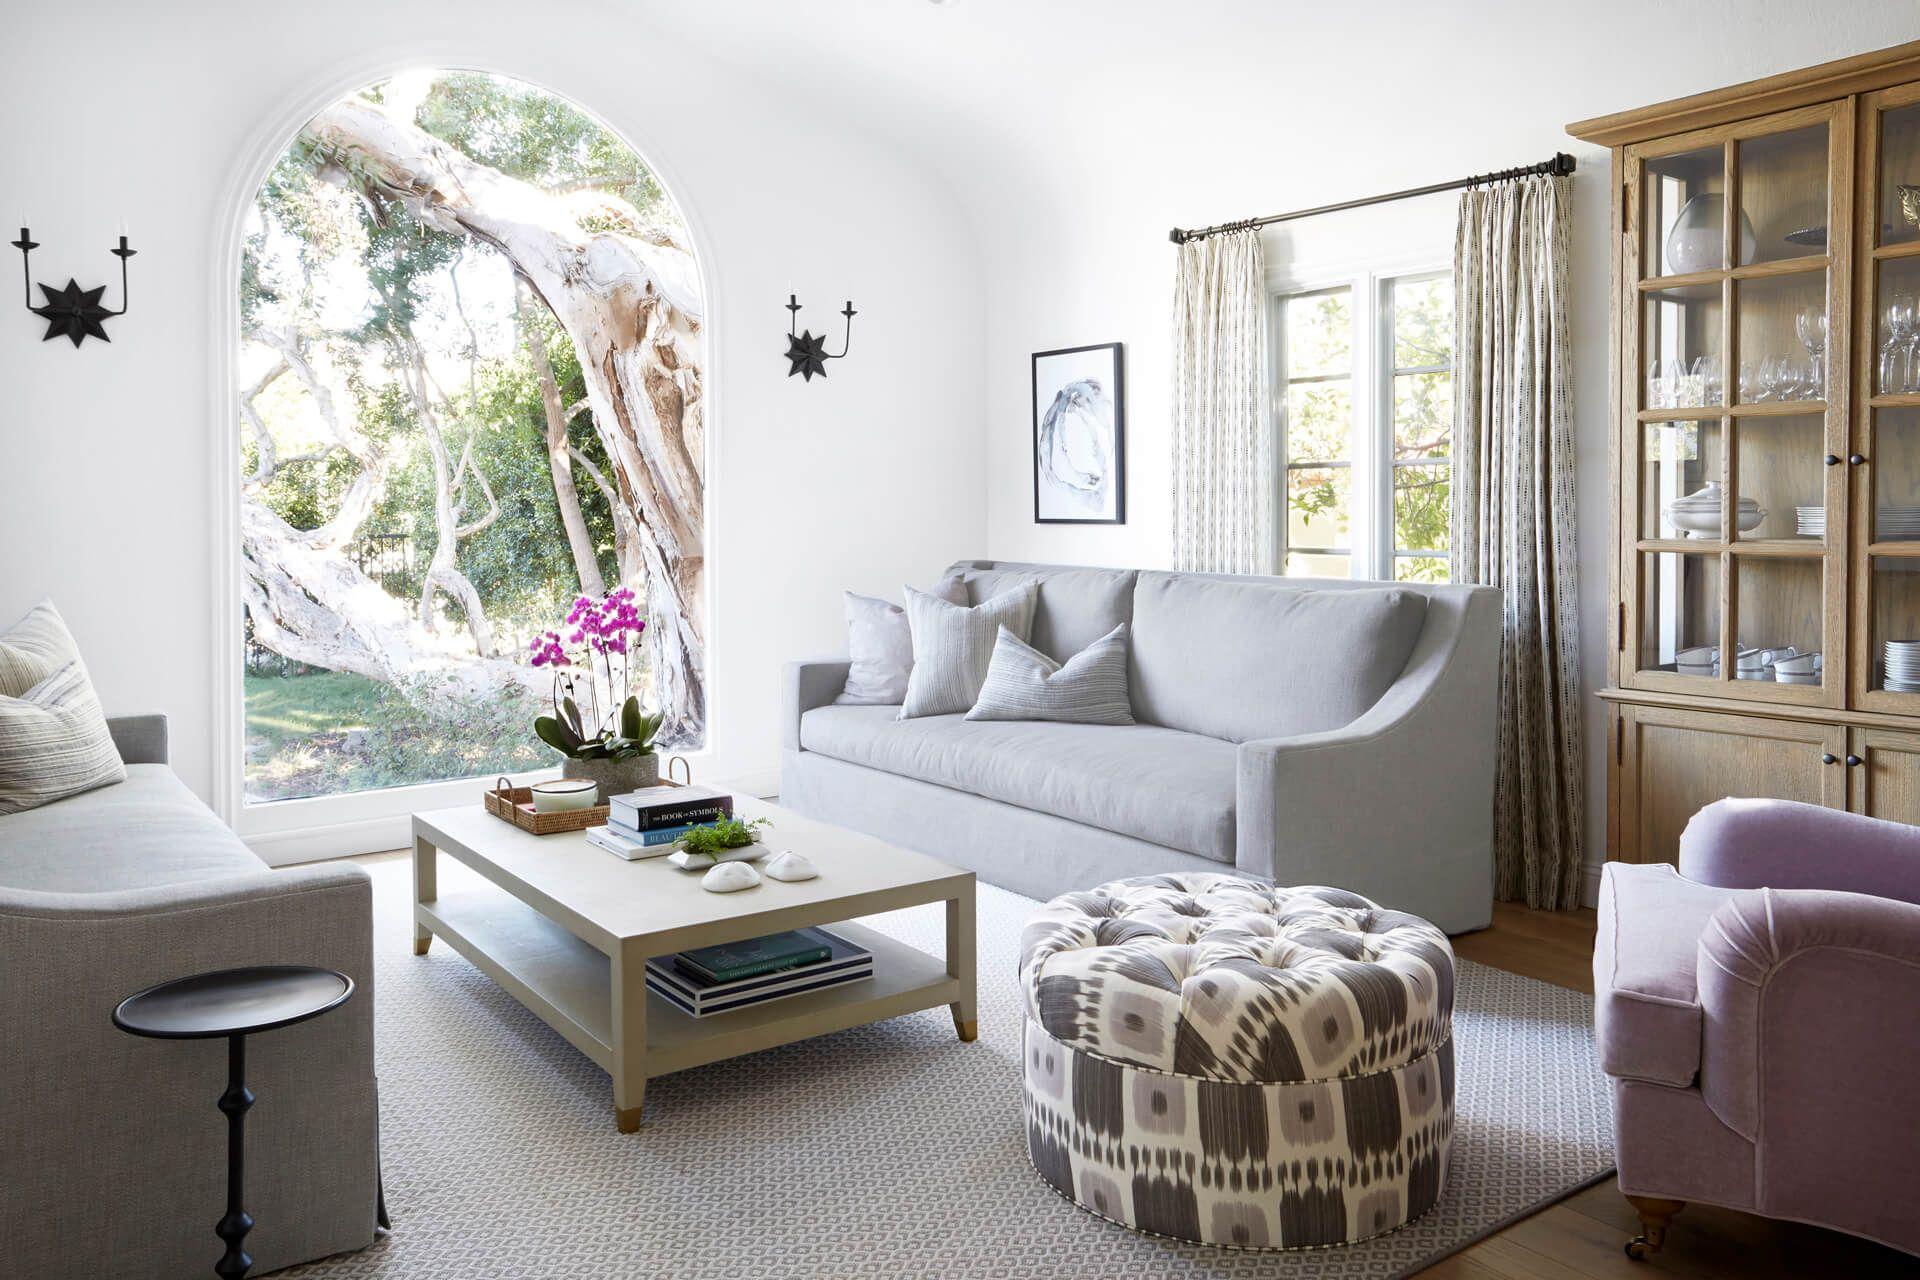 Best Brentwood Tudor Daleet Spector Design Interiordesign 400 x 300